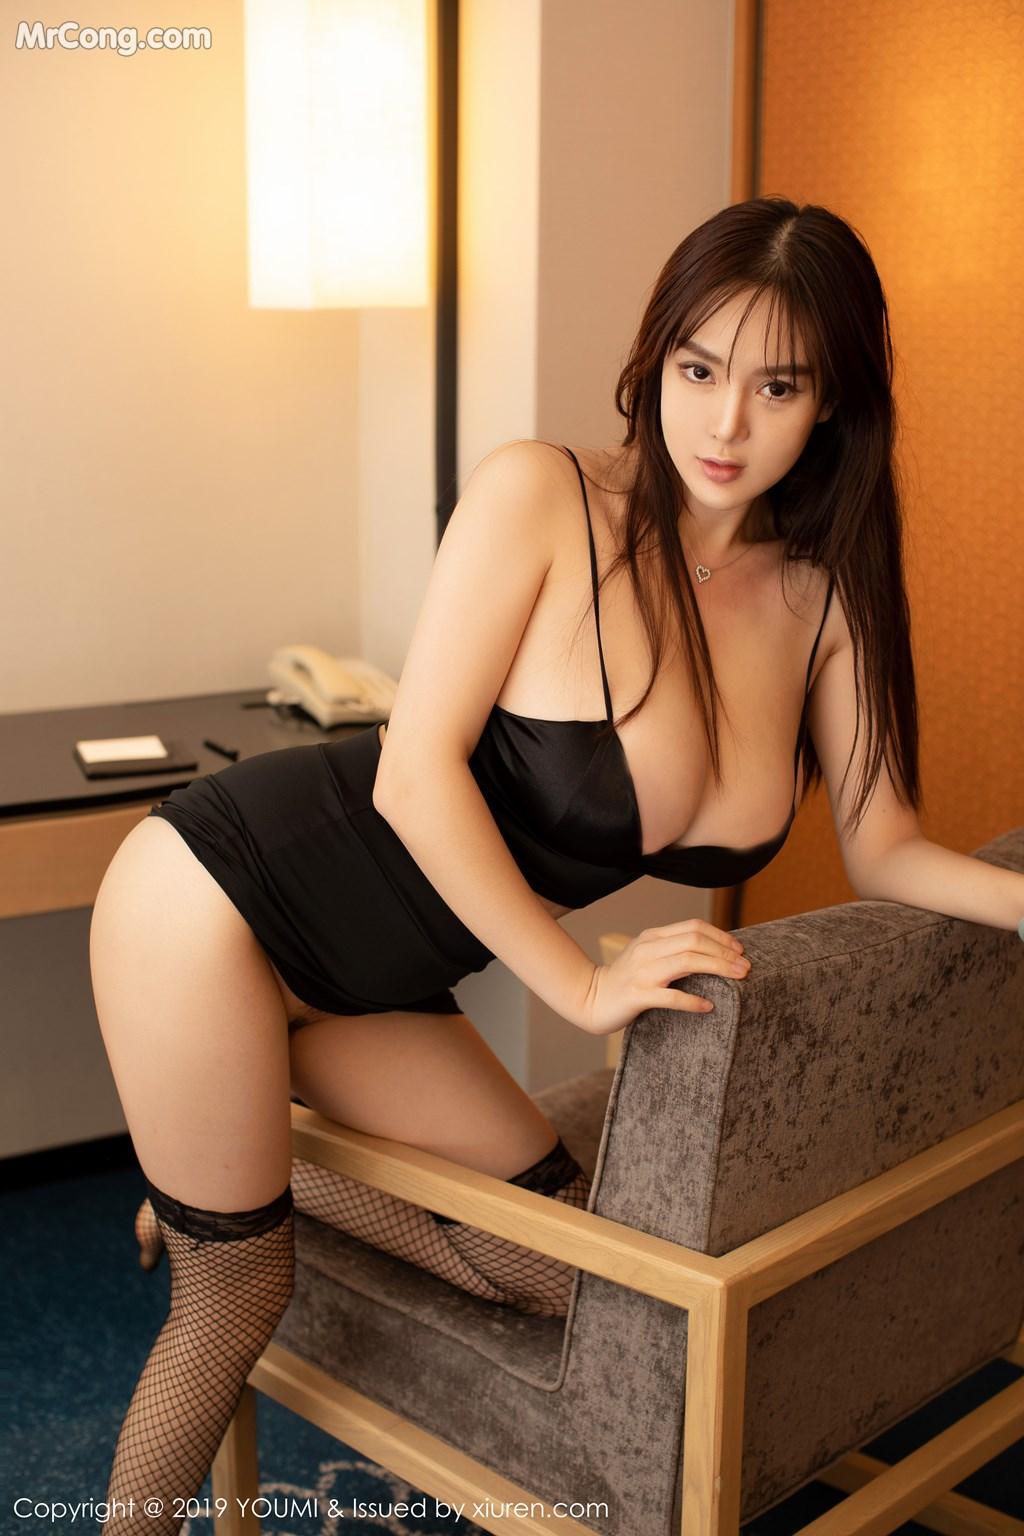 Image YouMi-Vol.311-Silvia-MrCong.com-031 in post YouMi Vol.311: 易阳Silvia (46 ảnh)